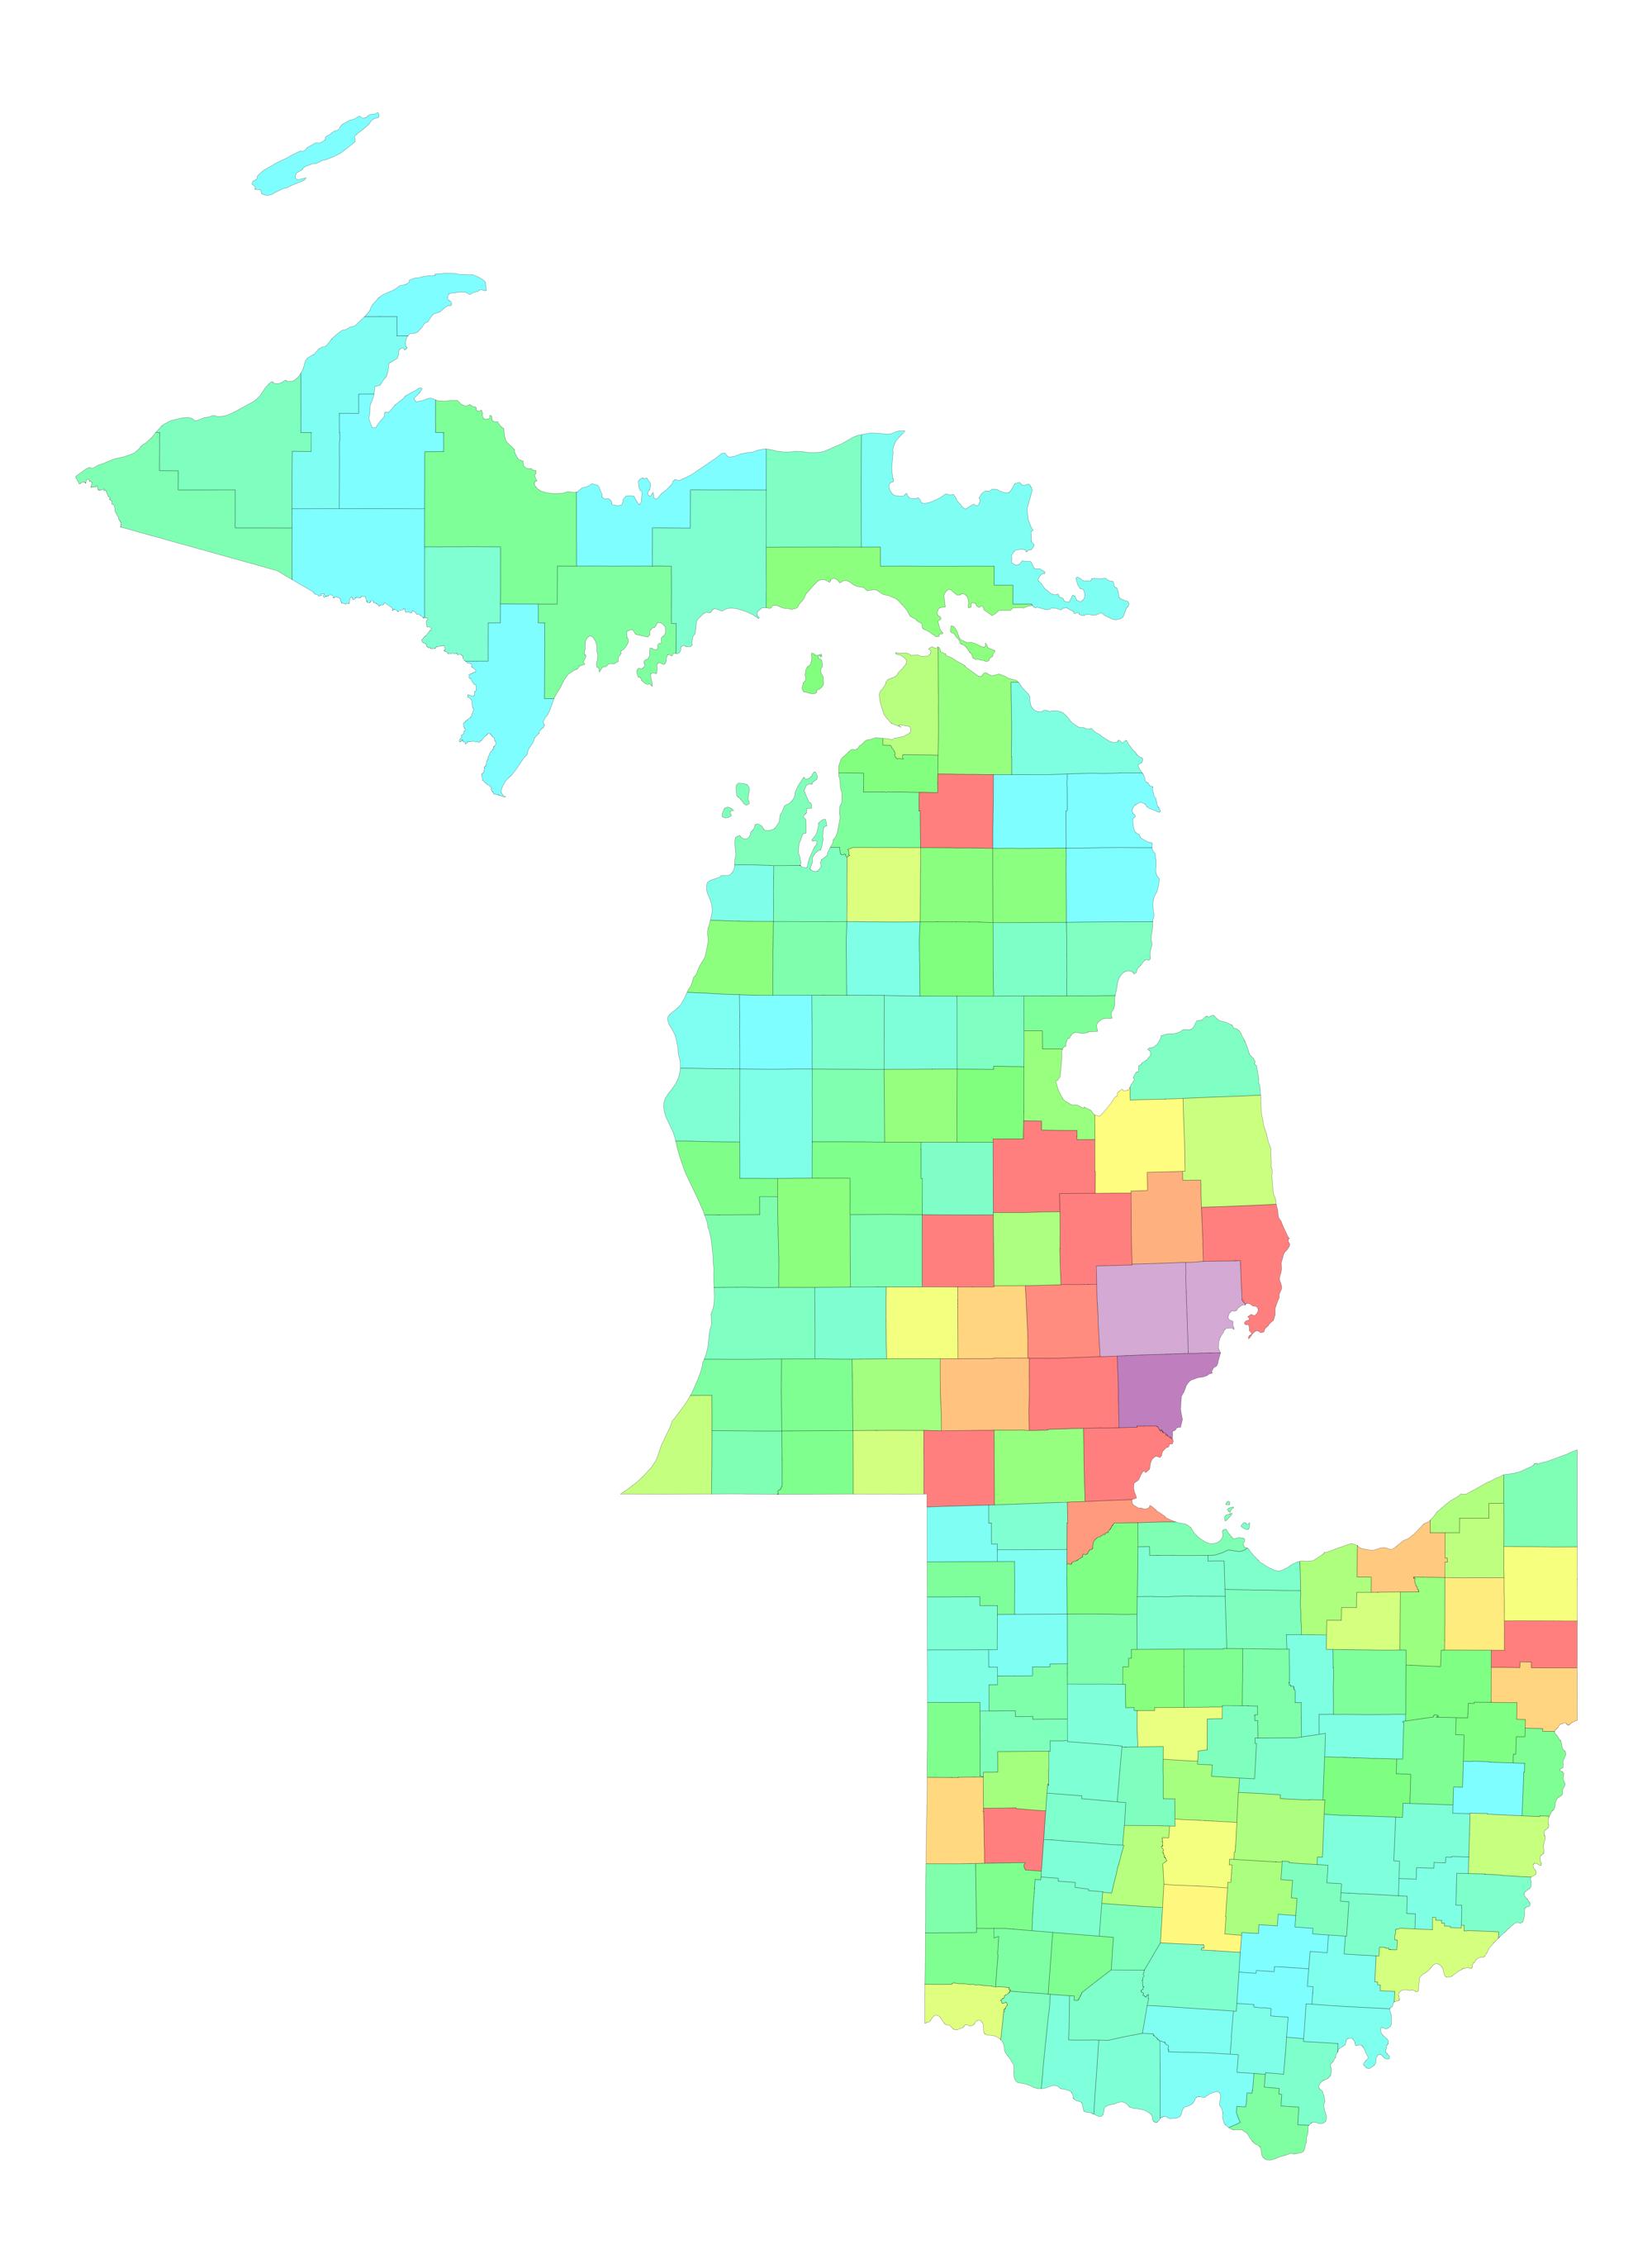 Map of Michigan and Ohio